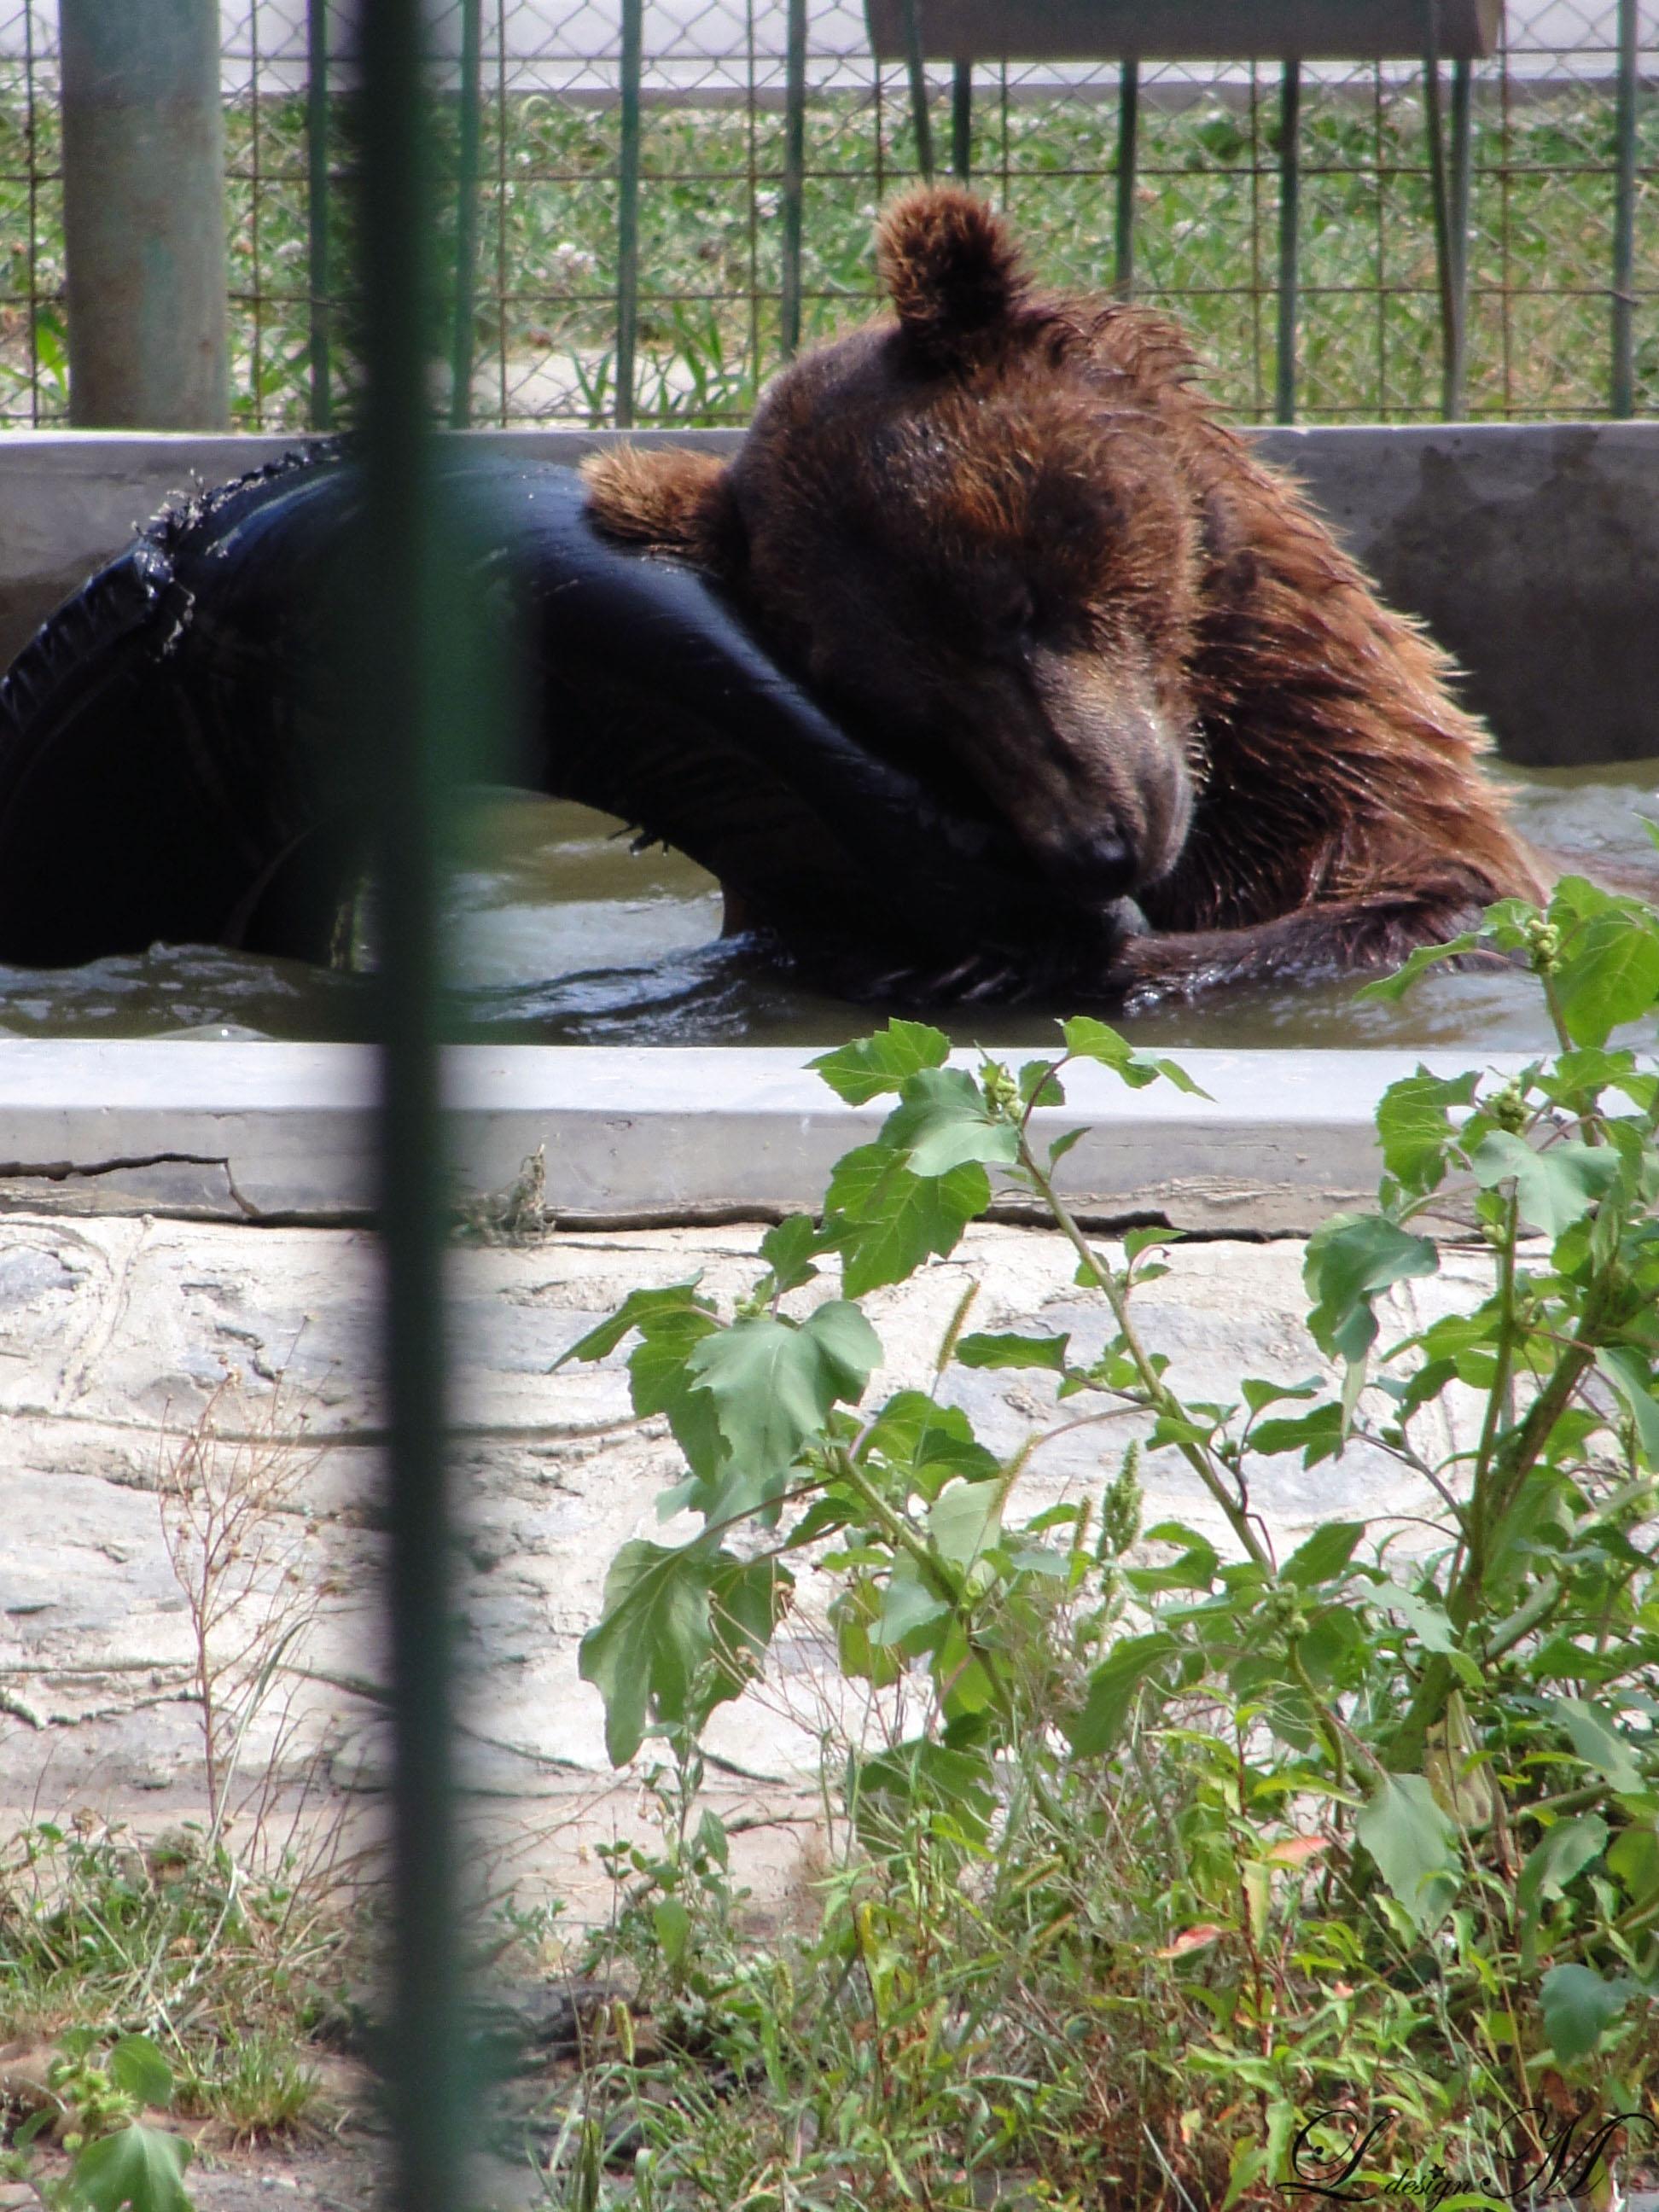 gradina-zoologica-zoo-Sibi-Romania-in-imagini-poze-baie-apa-urs-bear-joaca